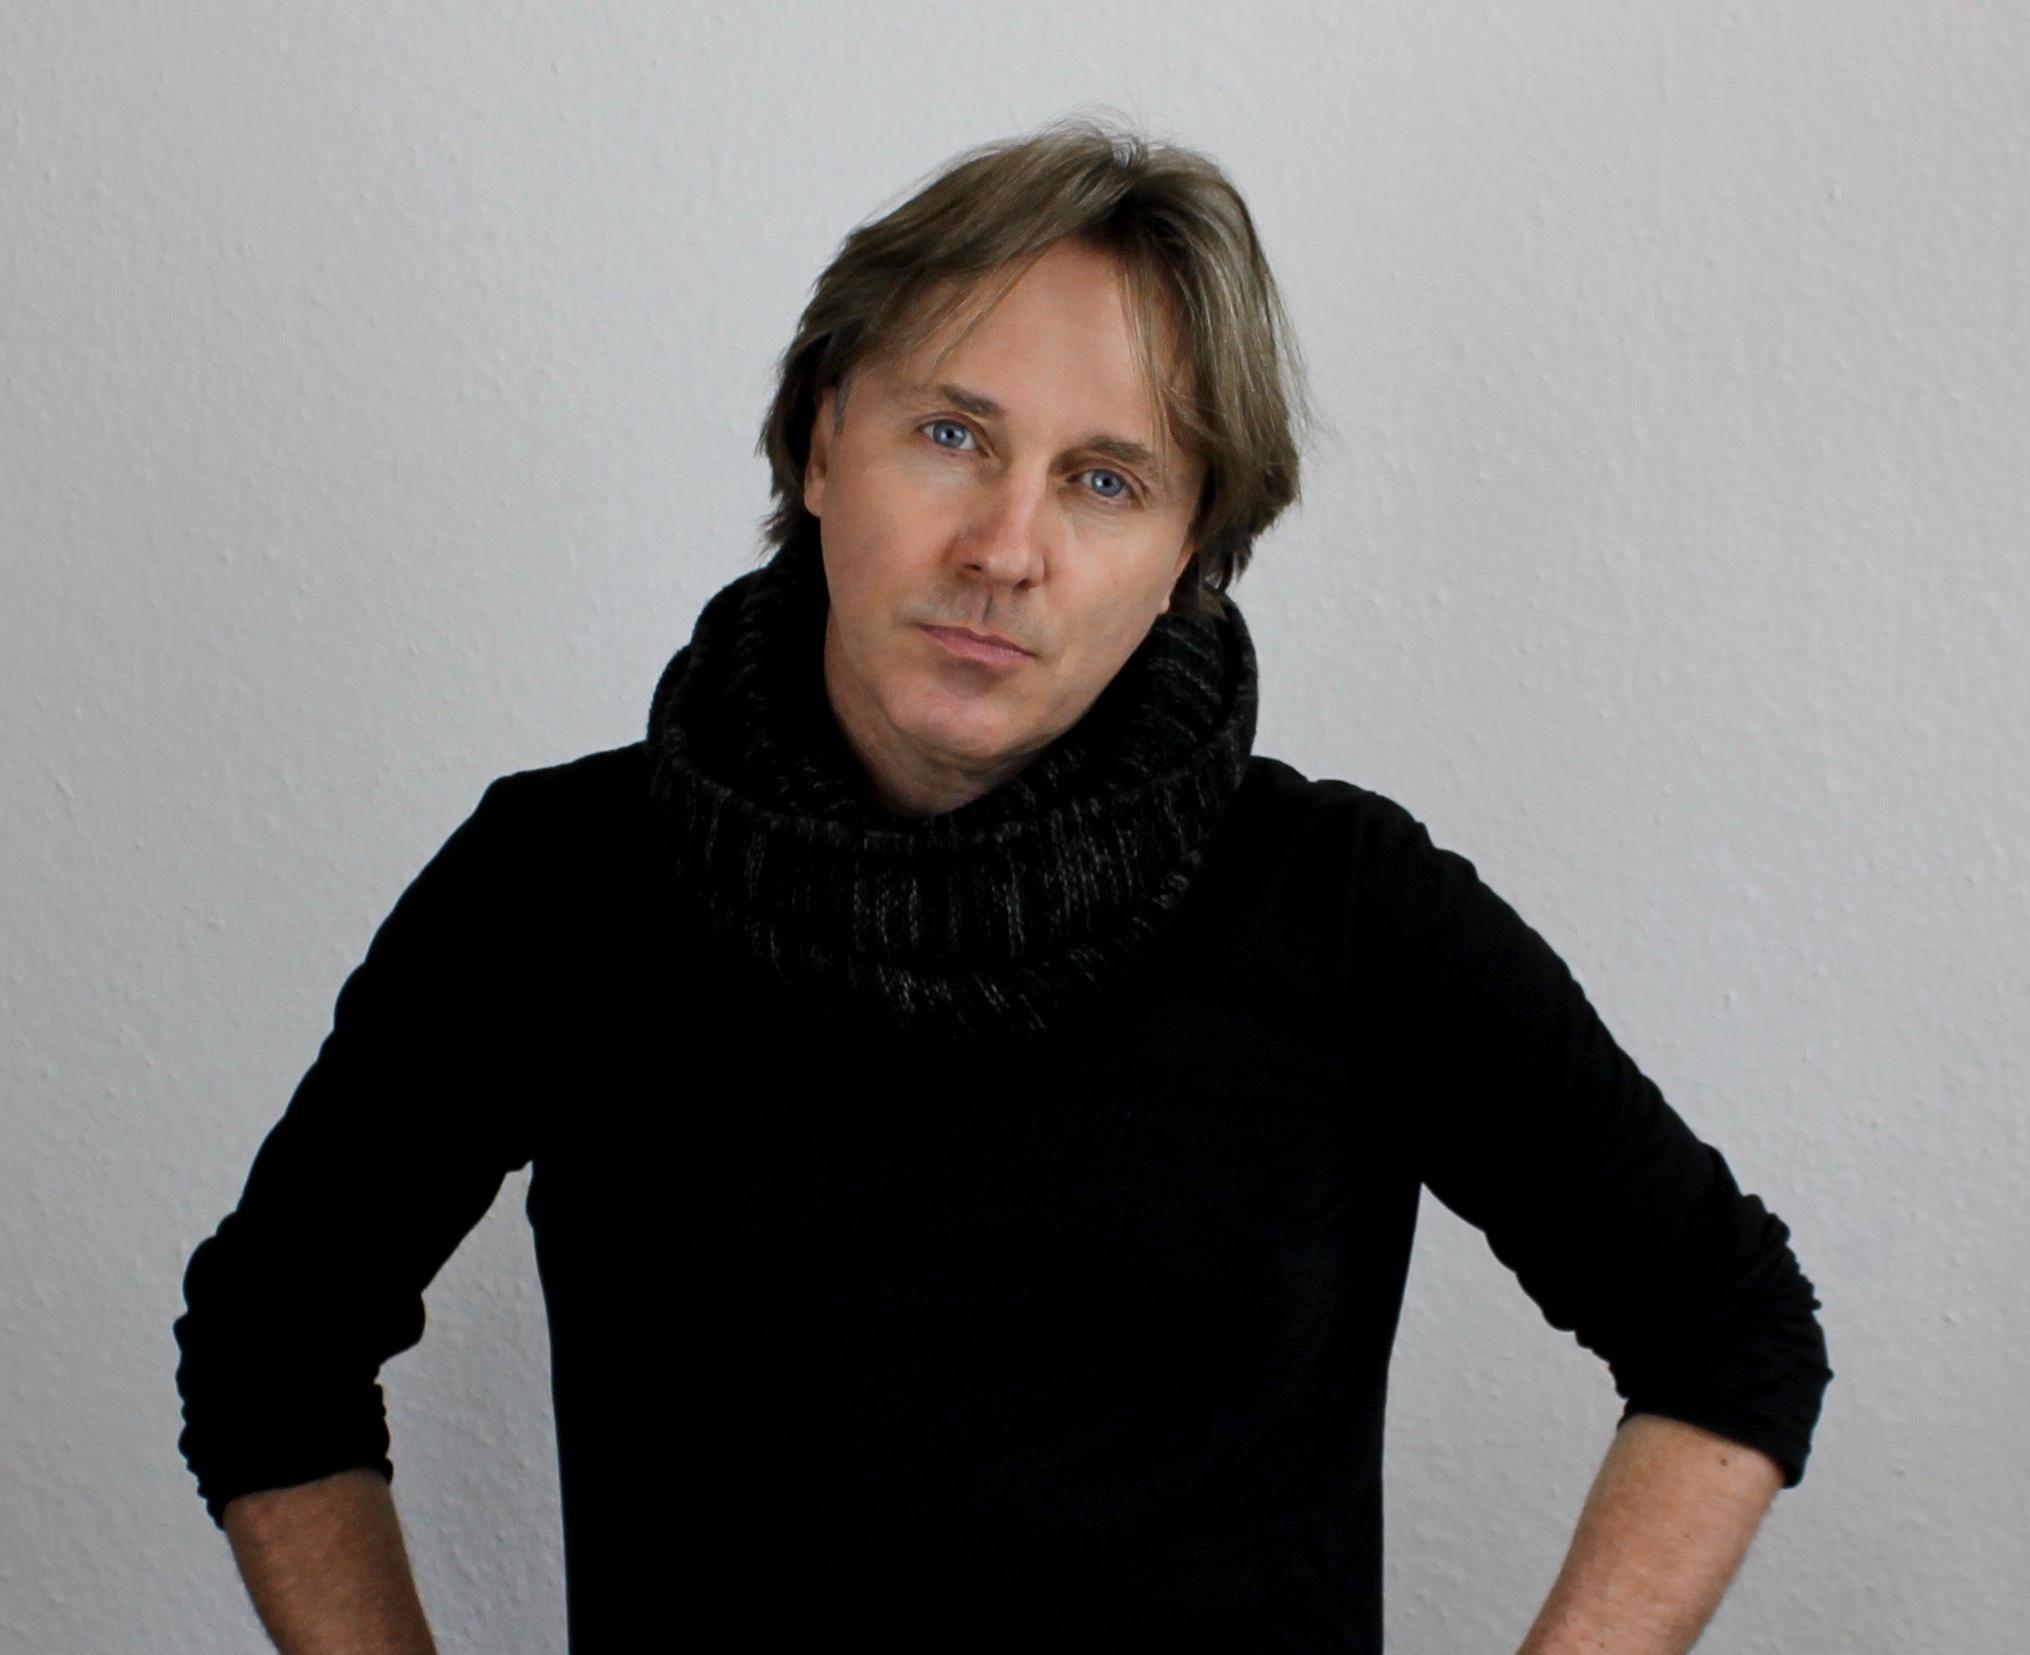 Michael Kaspar